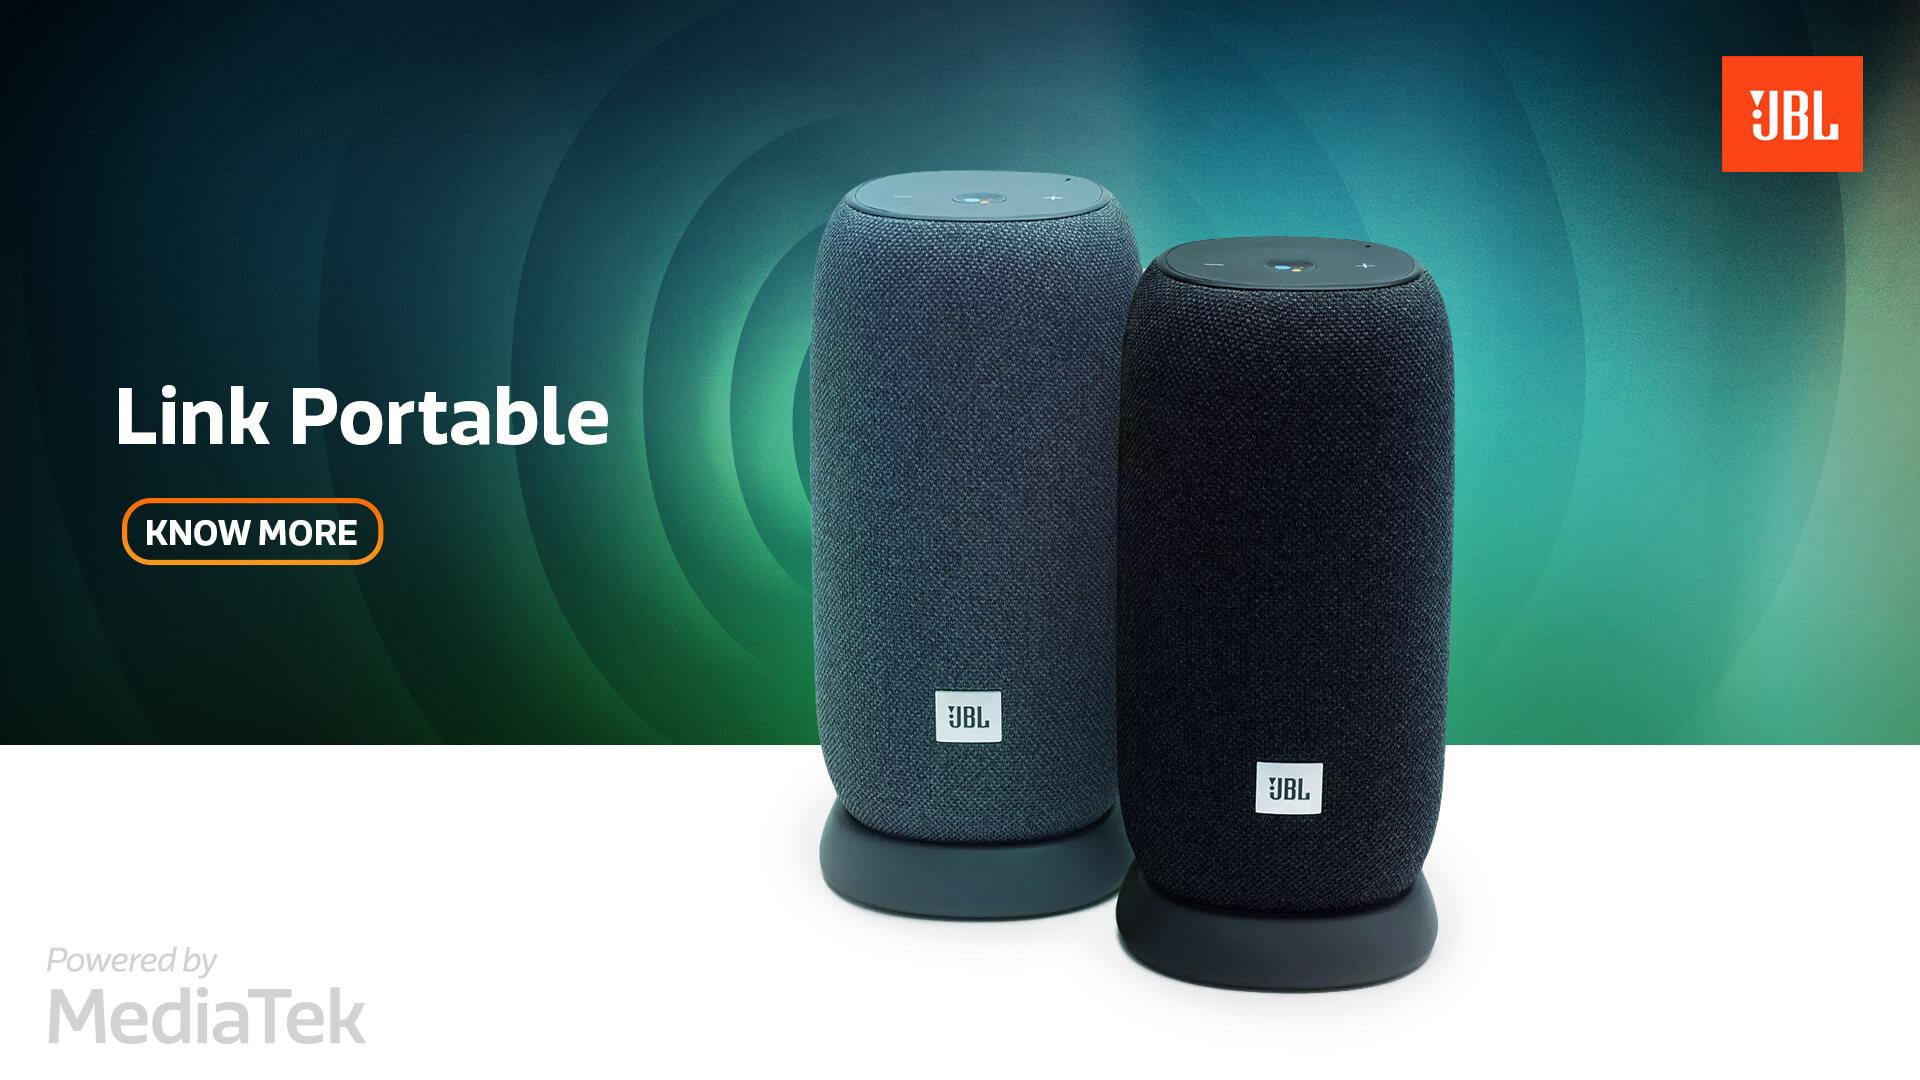 JBL_Link-Portable